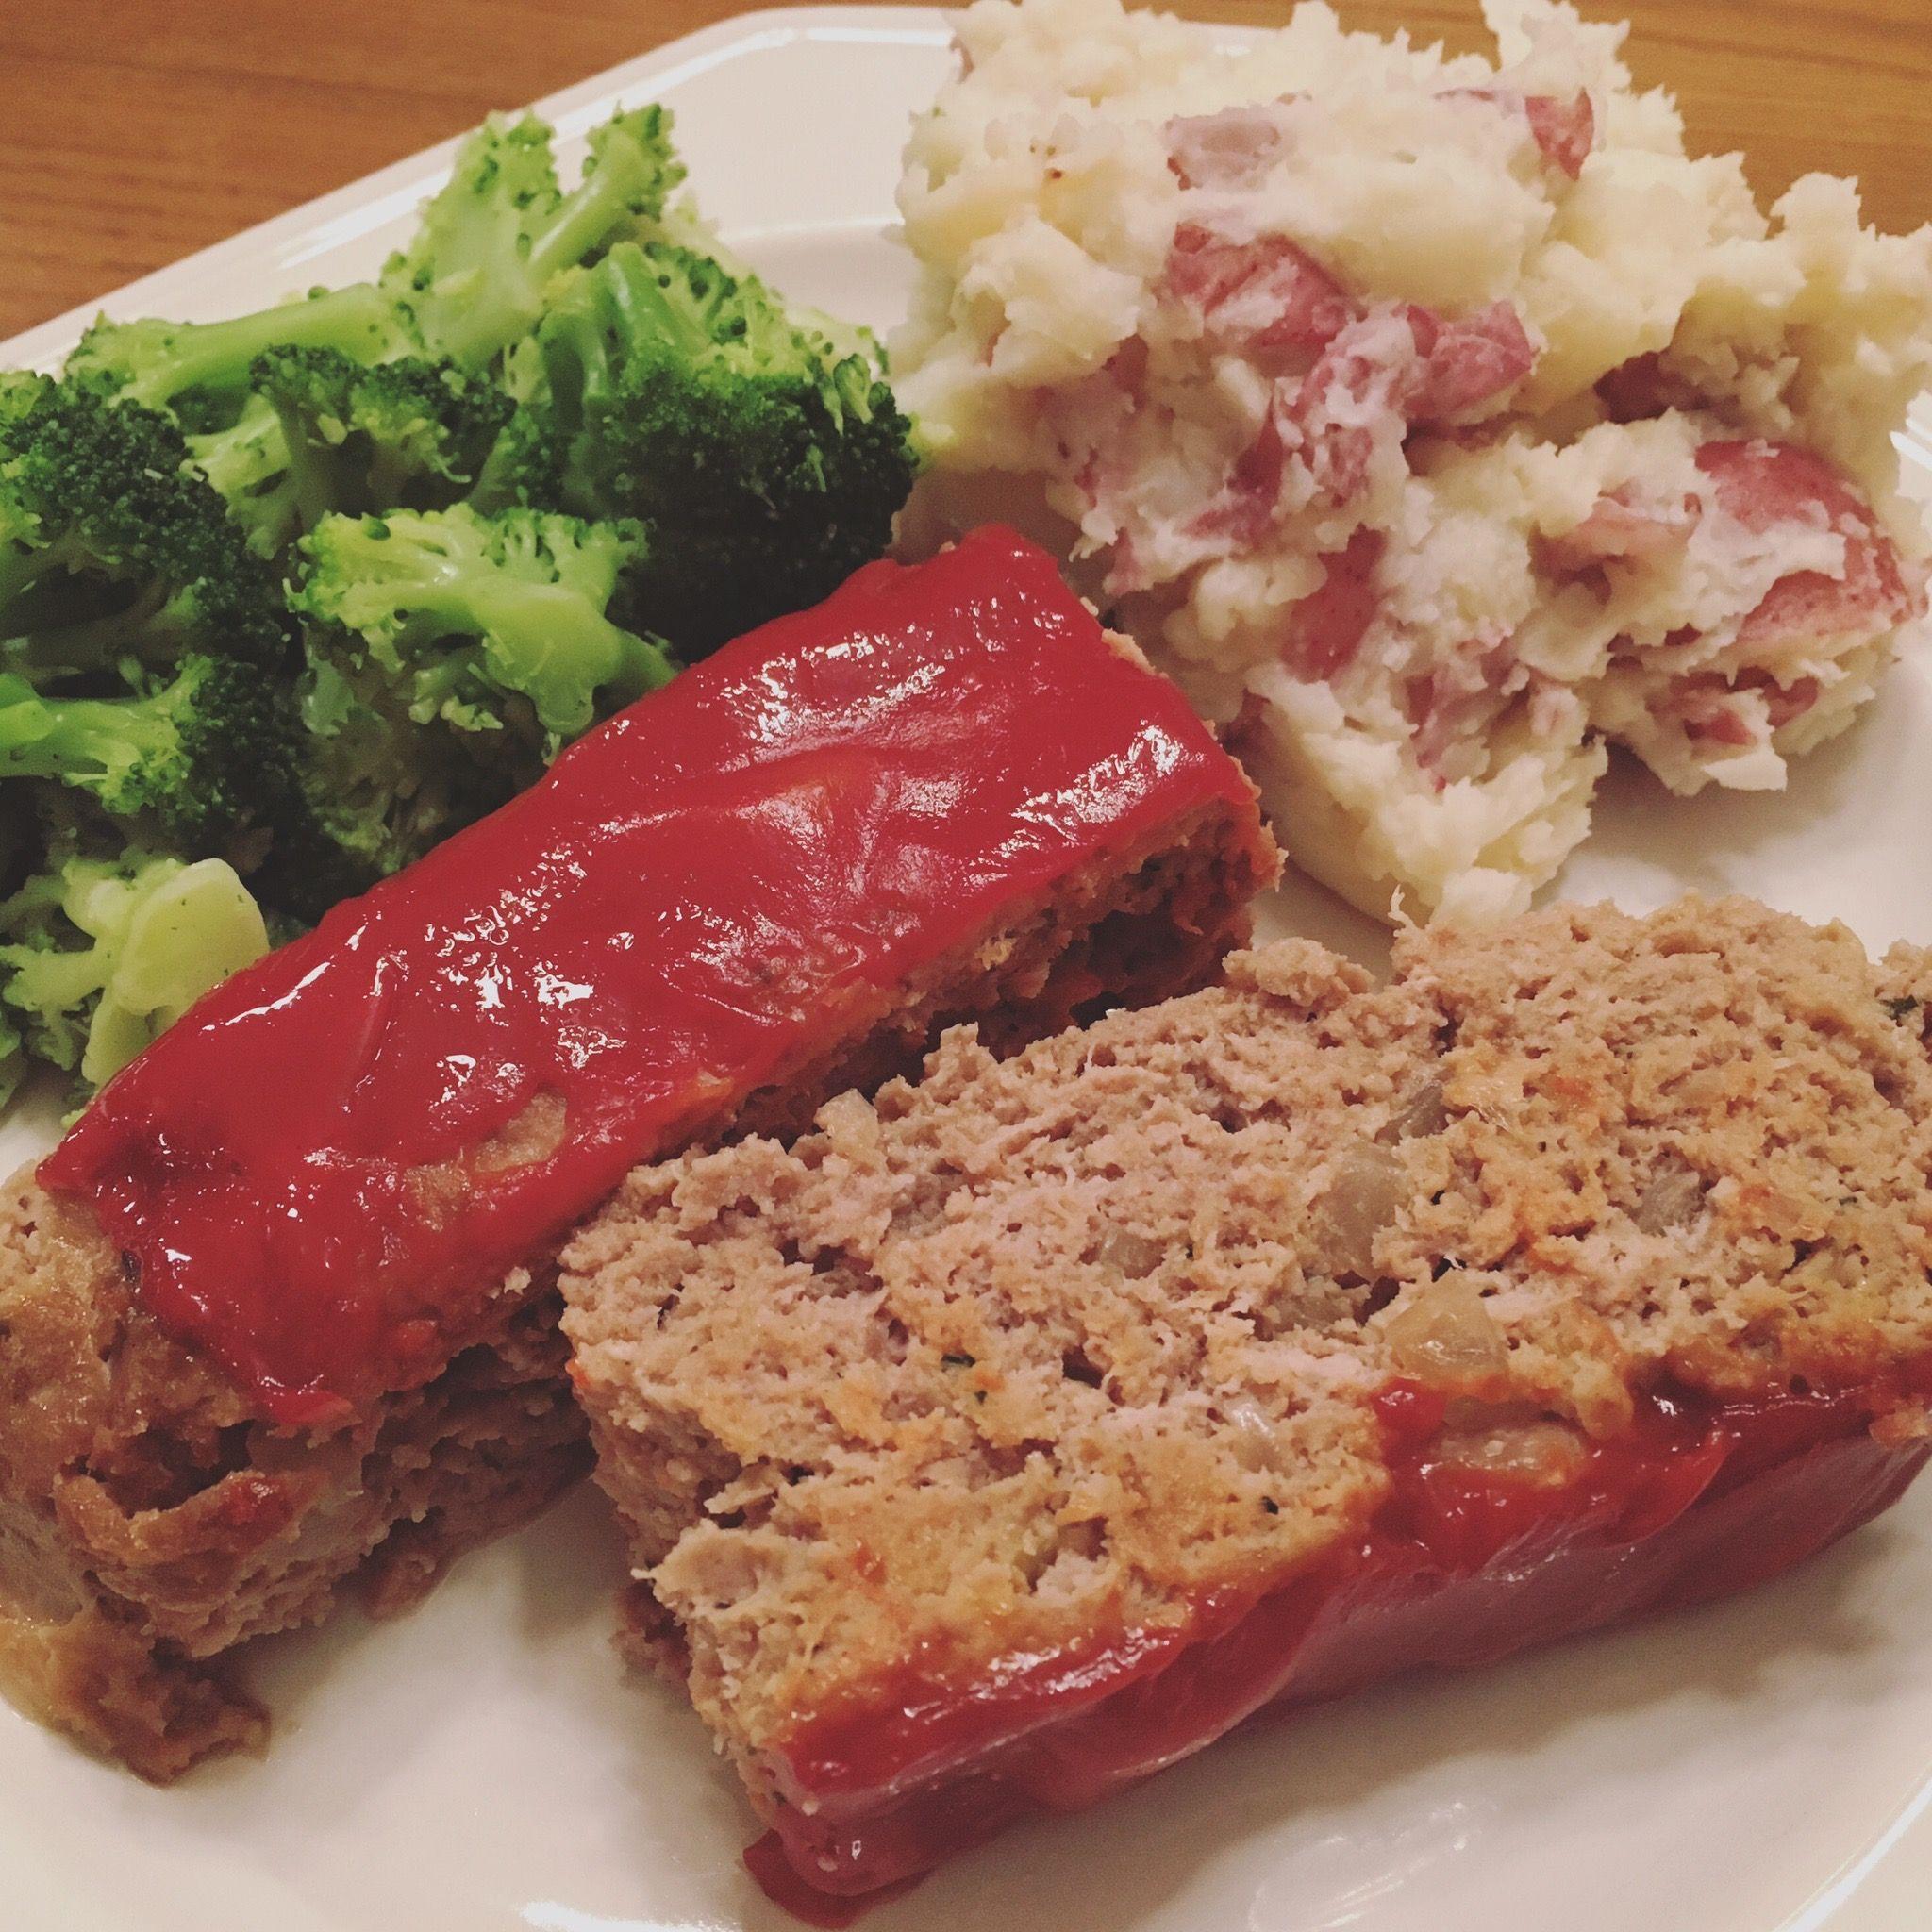 Barefoot Contessa Meatloaf Recipe With Panko Sante